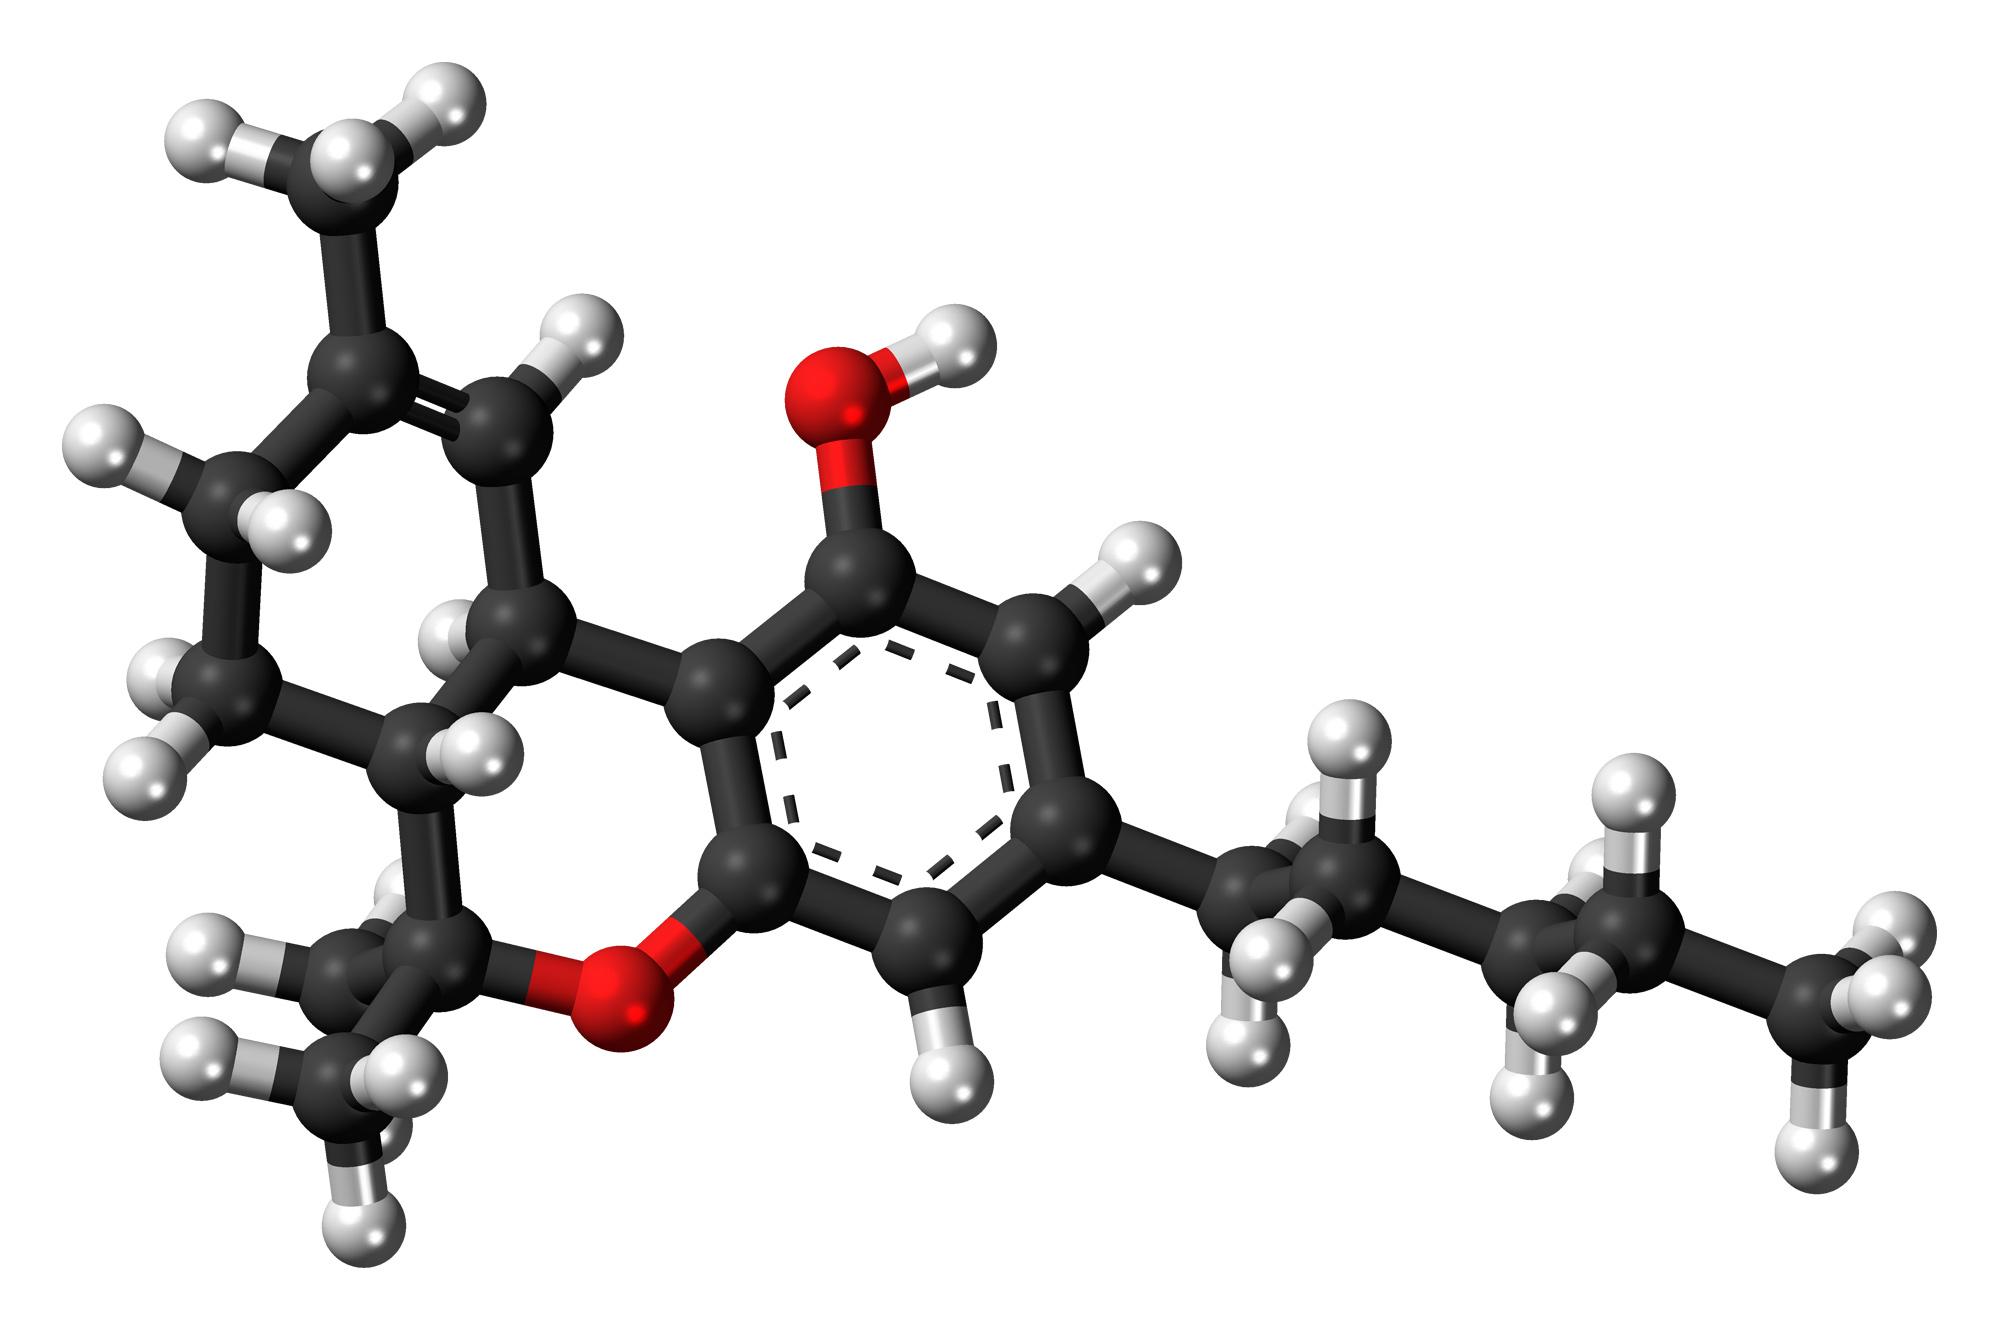 Тетрагидроканнабинол («Википедия»)